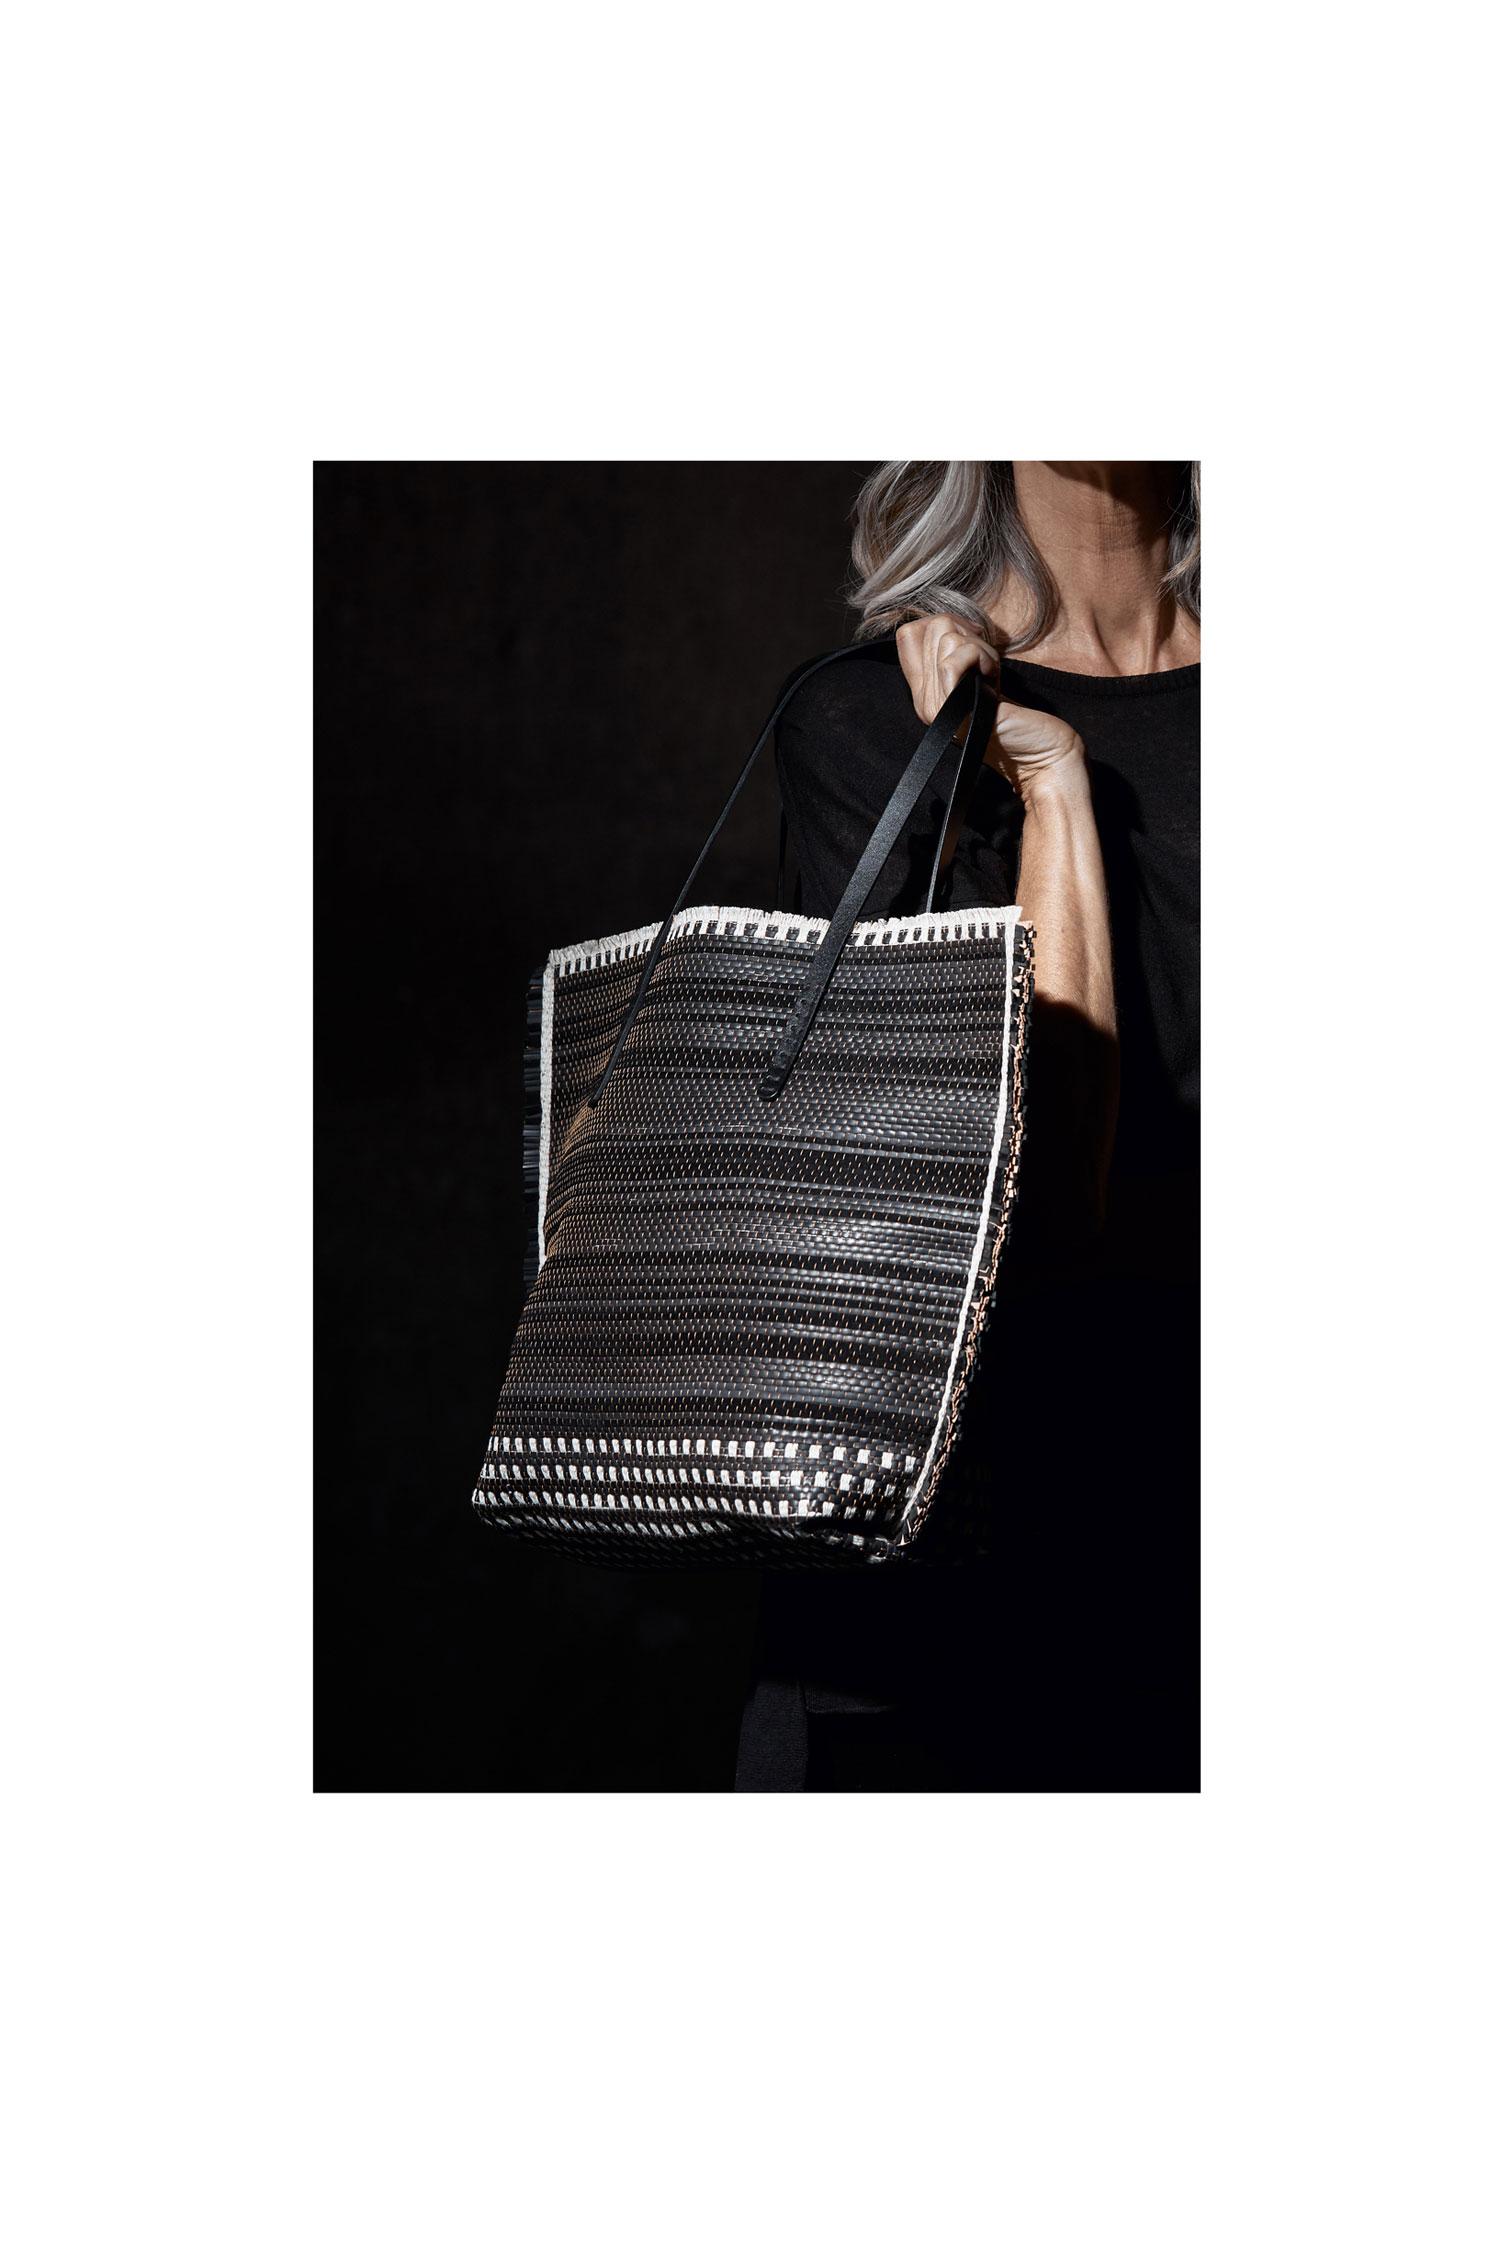 Annetta-Stripes-black-and-white_02_web.jpg